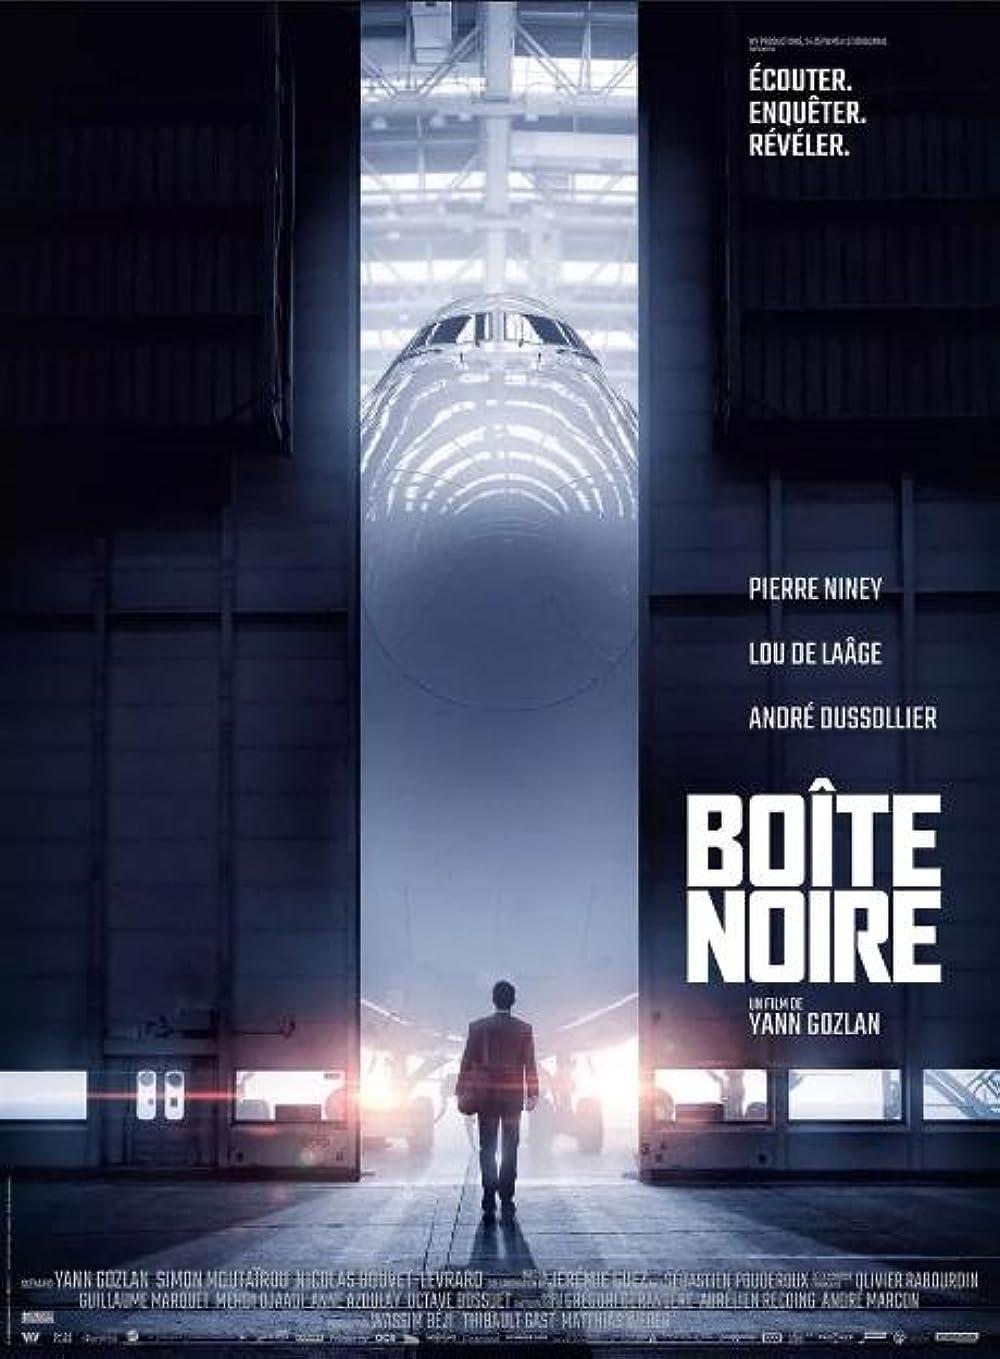 Download Boîte noire (2021) Telugu Dubbed (Voice Over) & English [Dual Audio] CAMRip 720p [1XBET] FREE on 1XCinema.com & KatMovieHD.sk